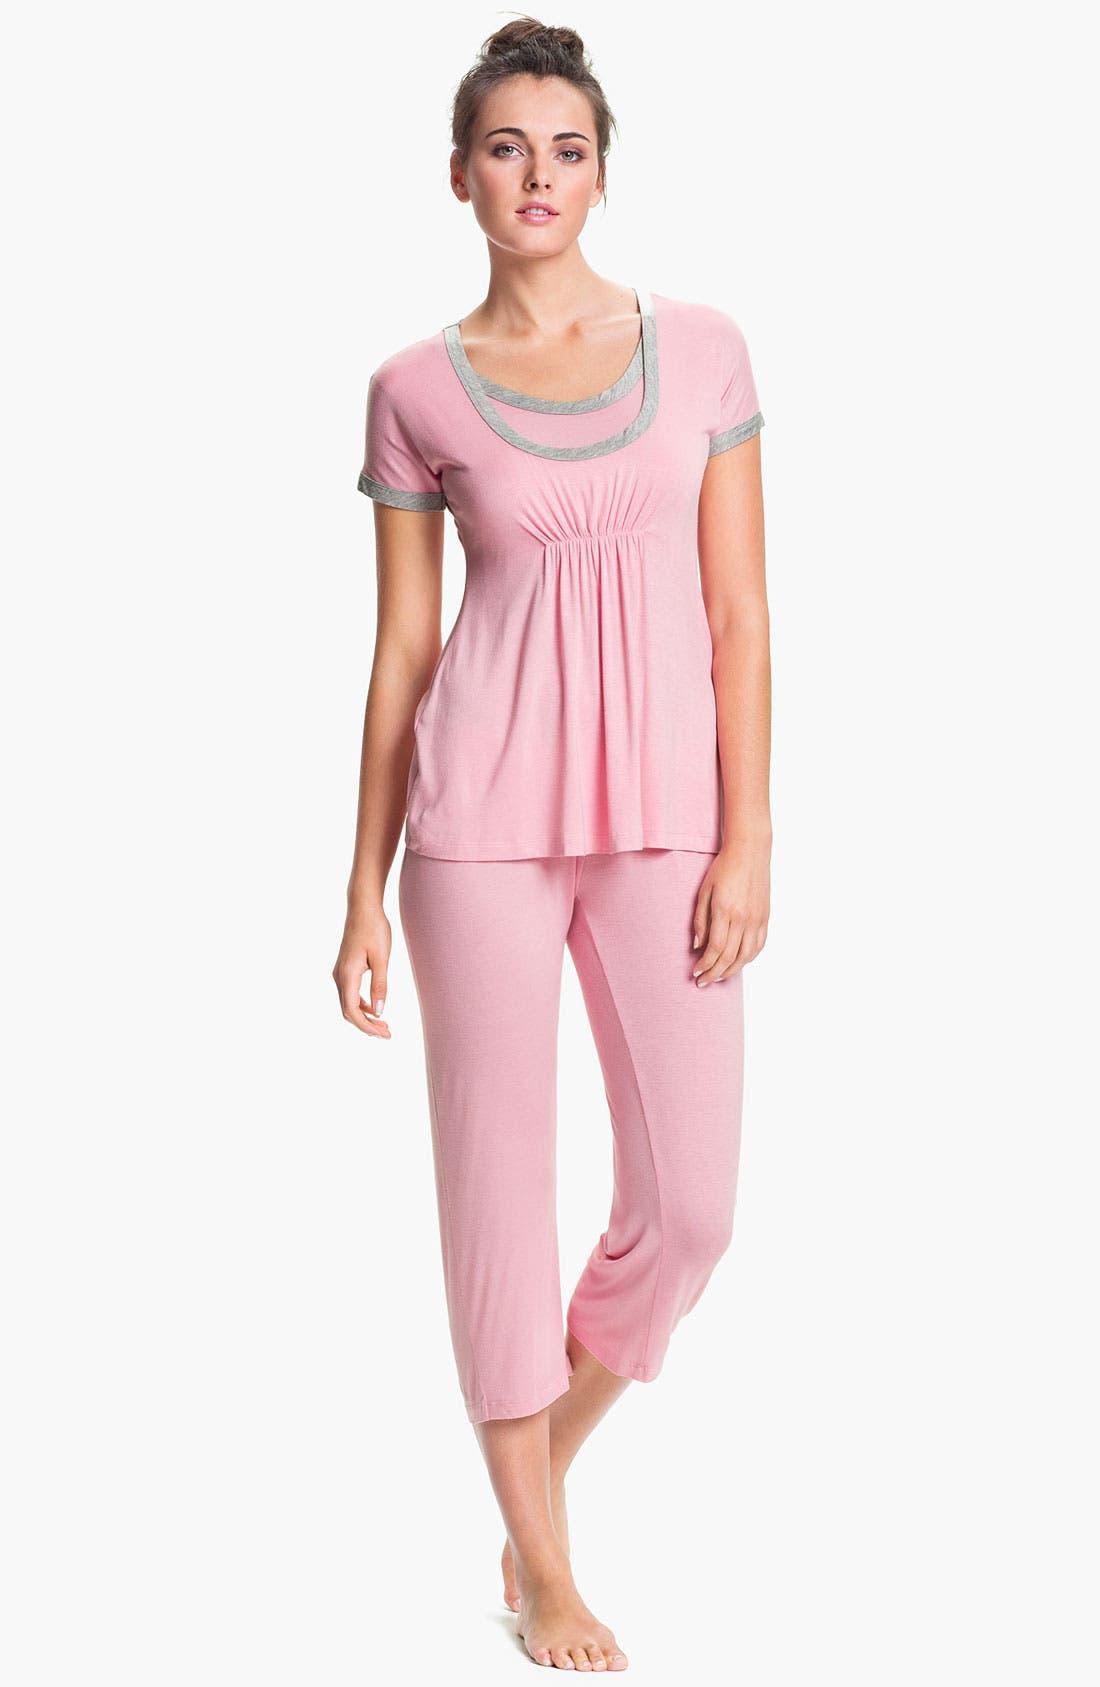 Main Image - Japanese Weekend Maternity Pajama Gift Set with Infant Blanket